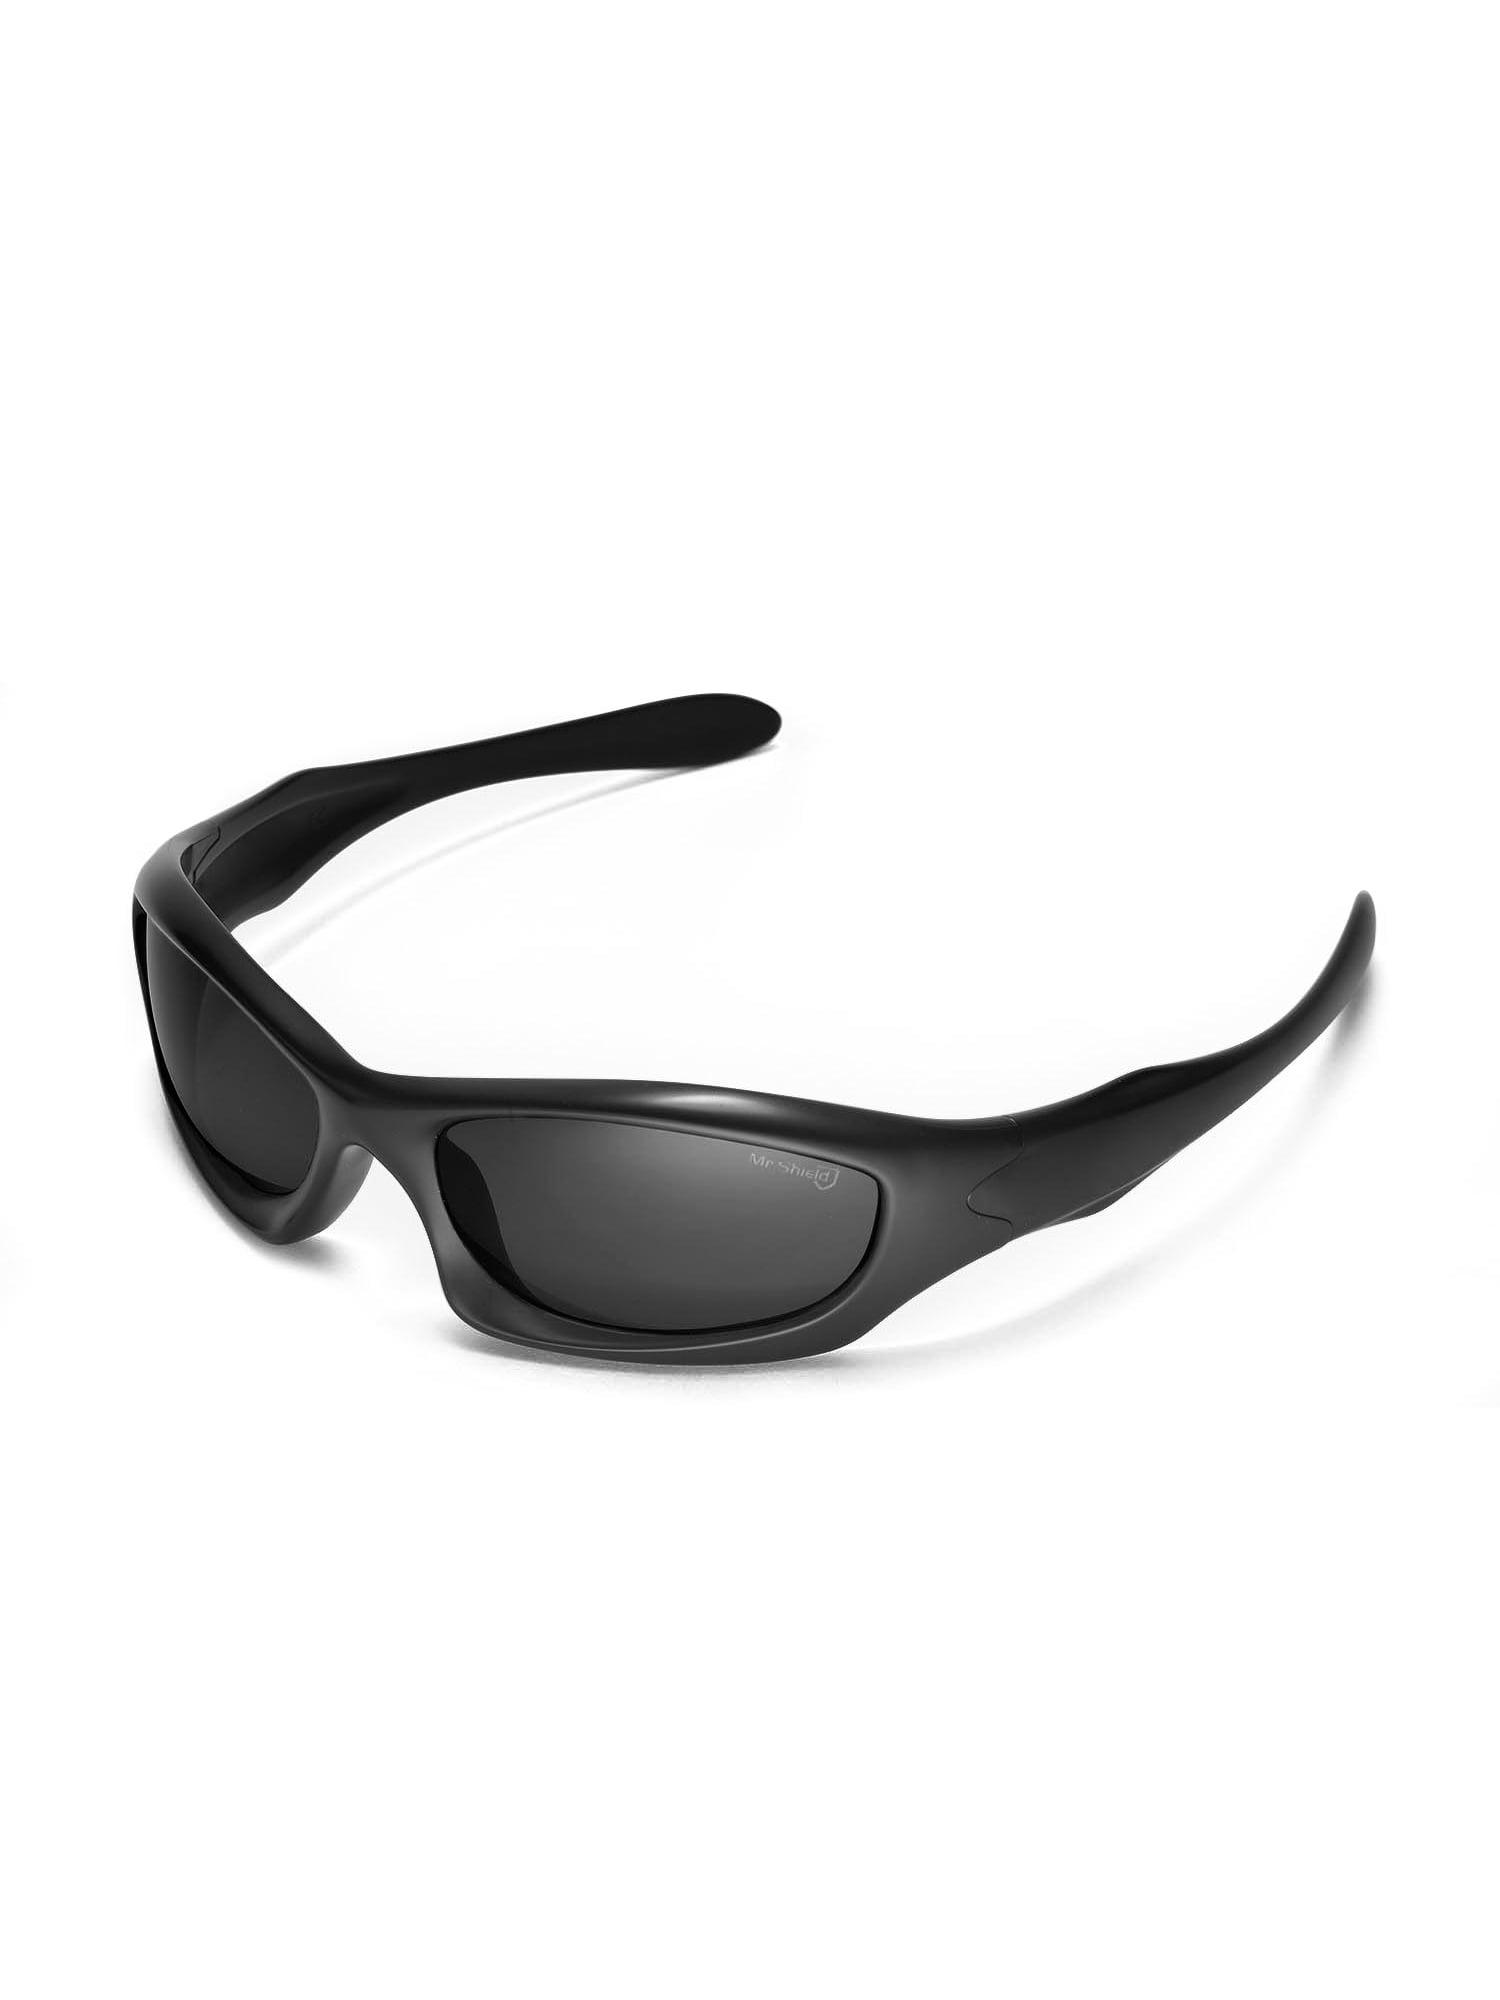 cf8efcc2ea Walleva - Walleva Black ISARC Polarized Replacement Lenses for Oakley  Monster Dog Sunglasses - Walmart.com